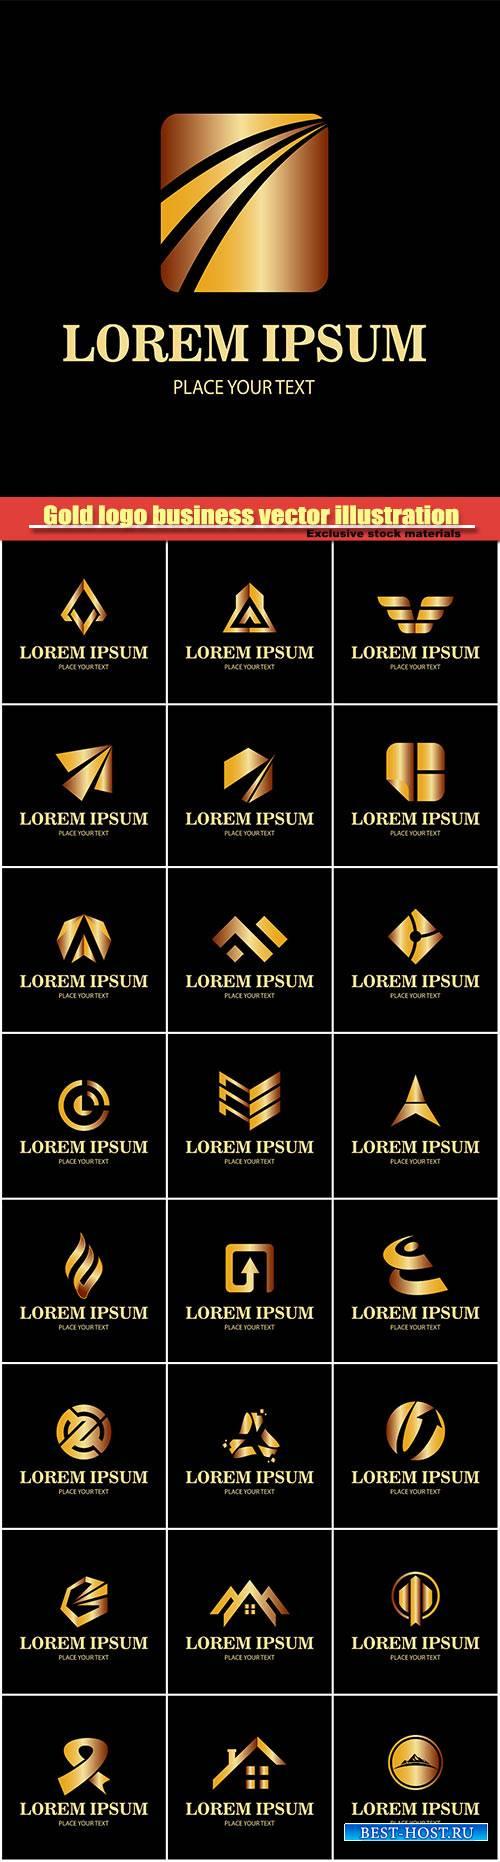 Gold logo business, vector illustration #4